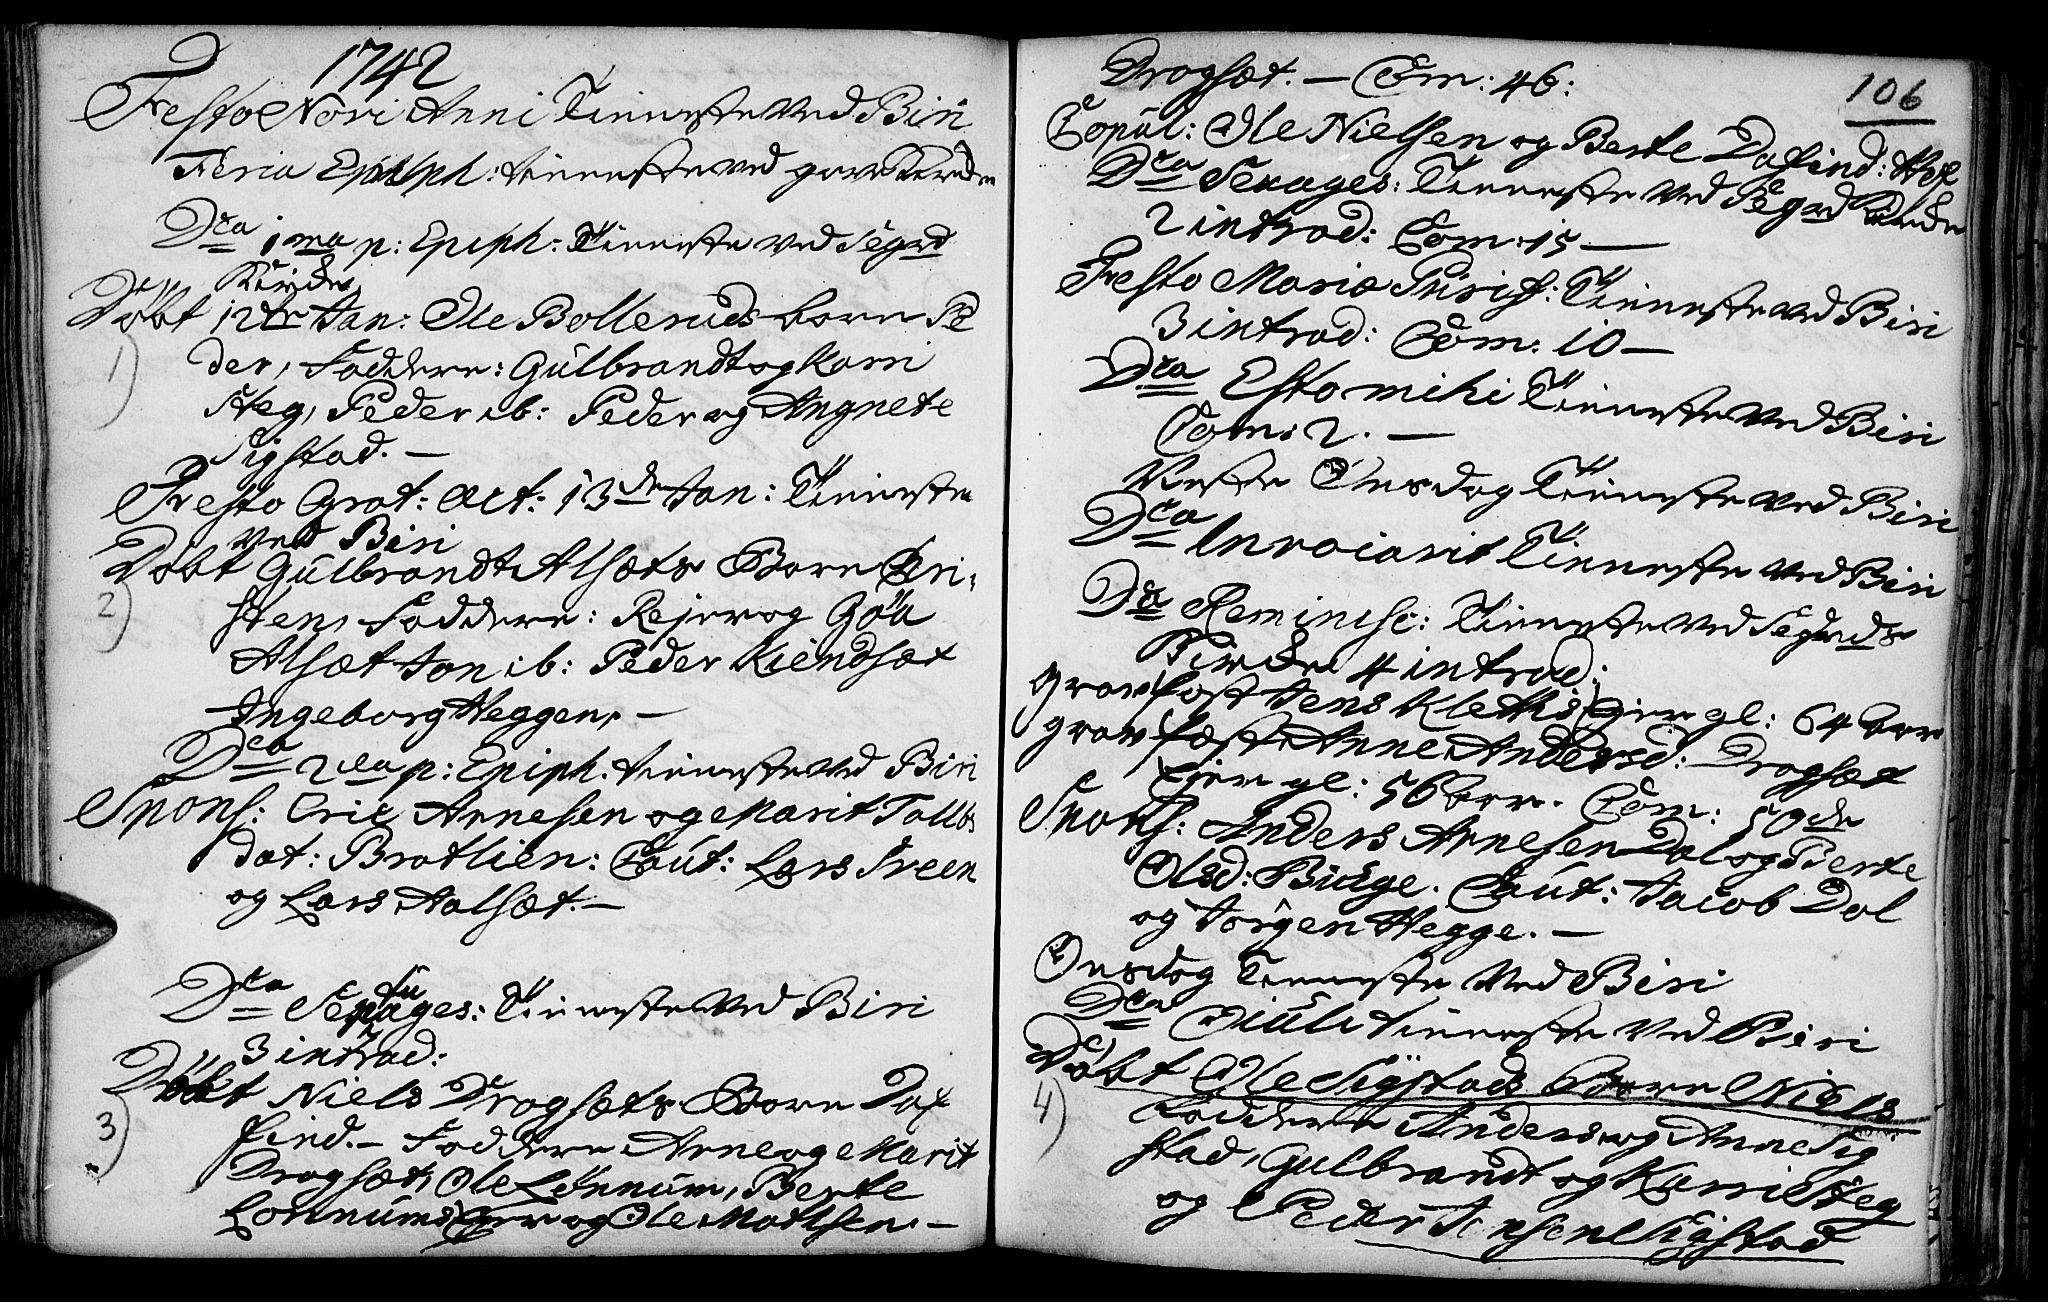 SAH, Biri prestekontor, Ministerialbok nr. 1, 1730-1754, s. 106